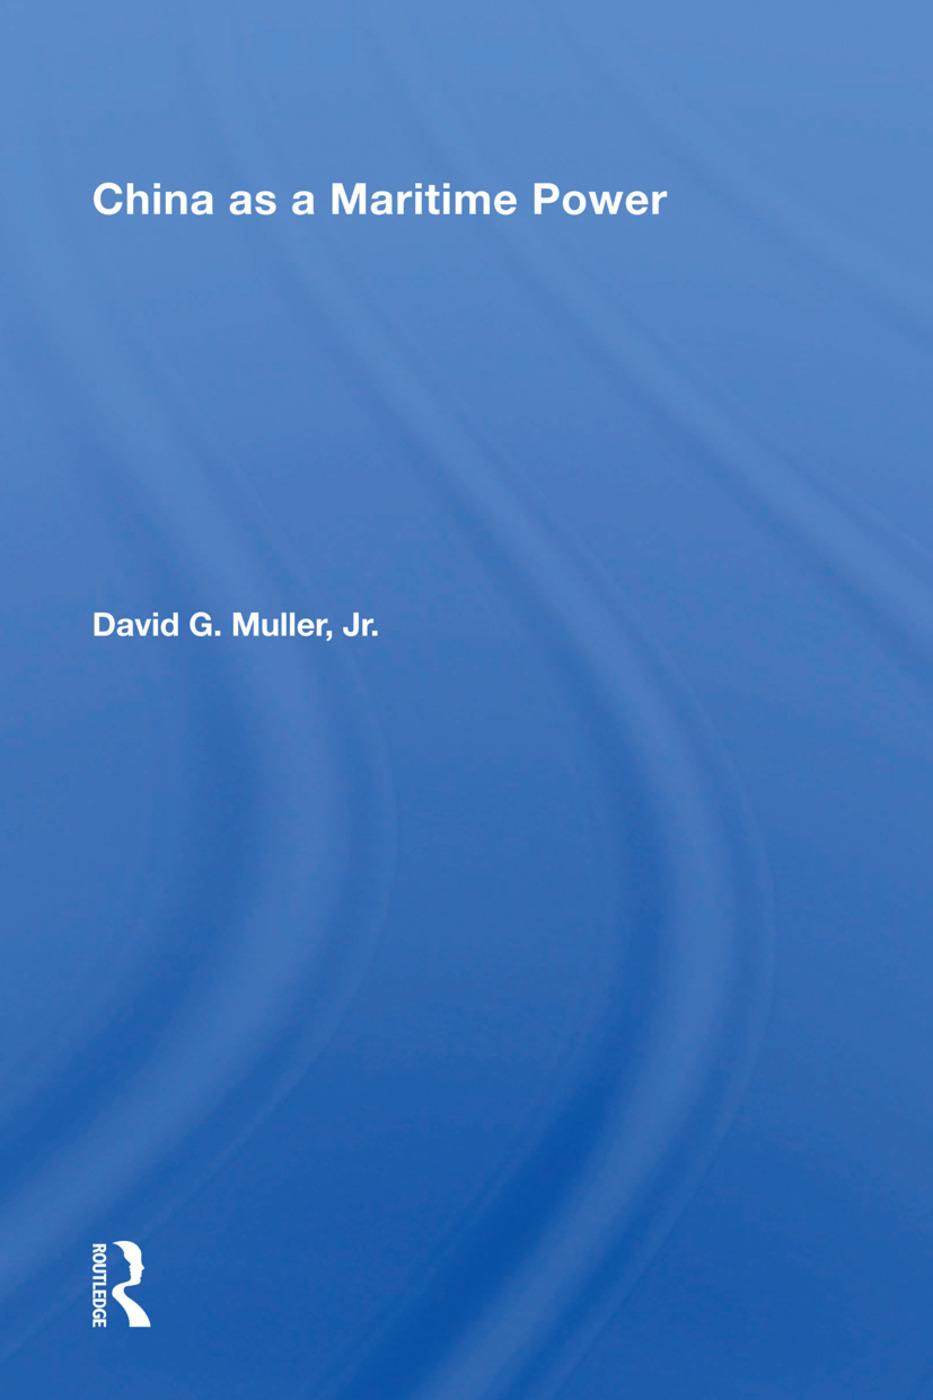 Naval History, 1971-1983